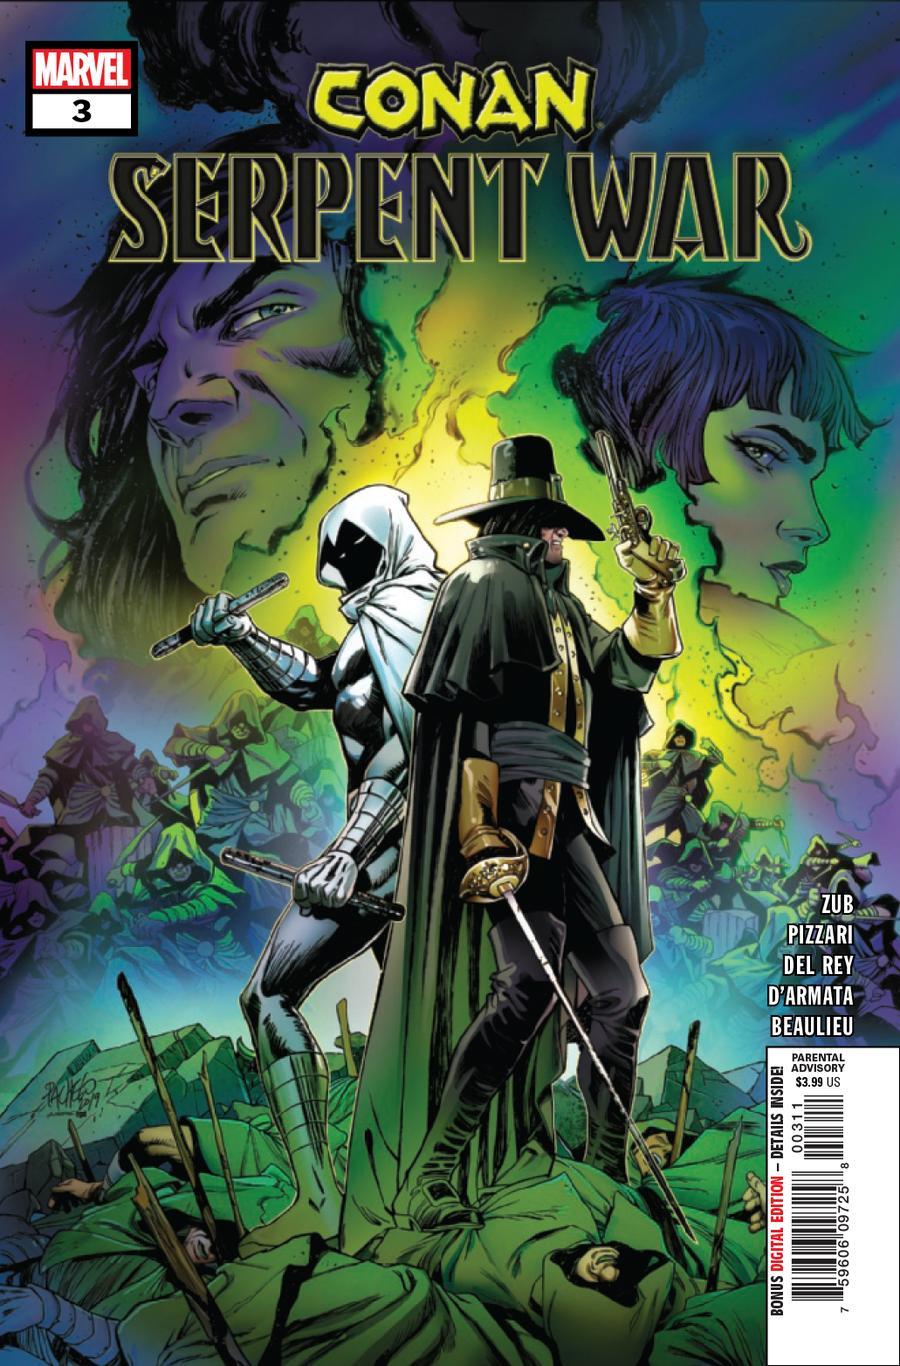 Conan Serpent War #3 Cover A Regular Carlos Pacheco Cover